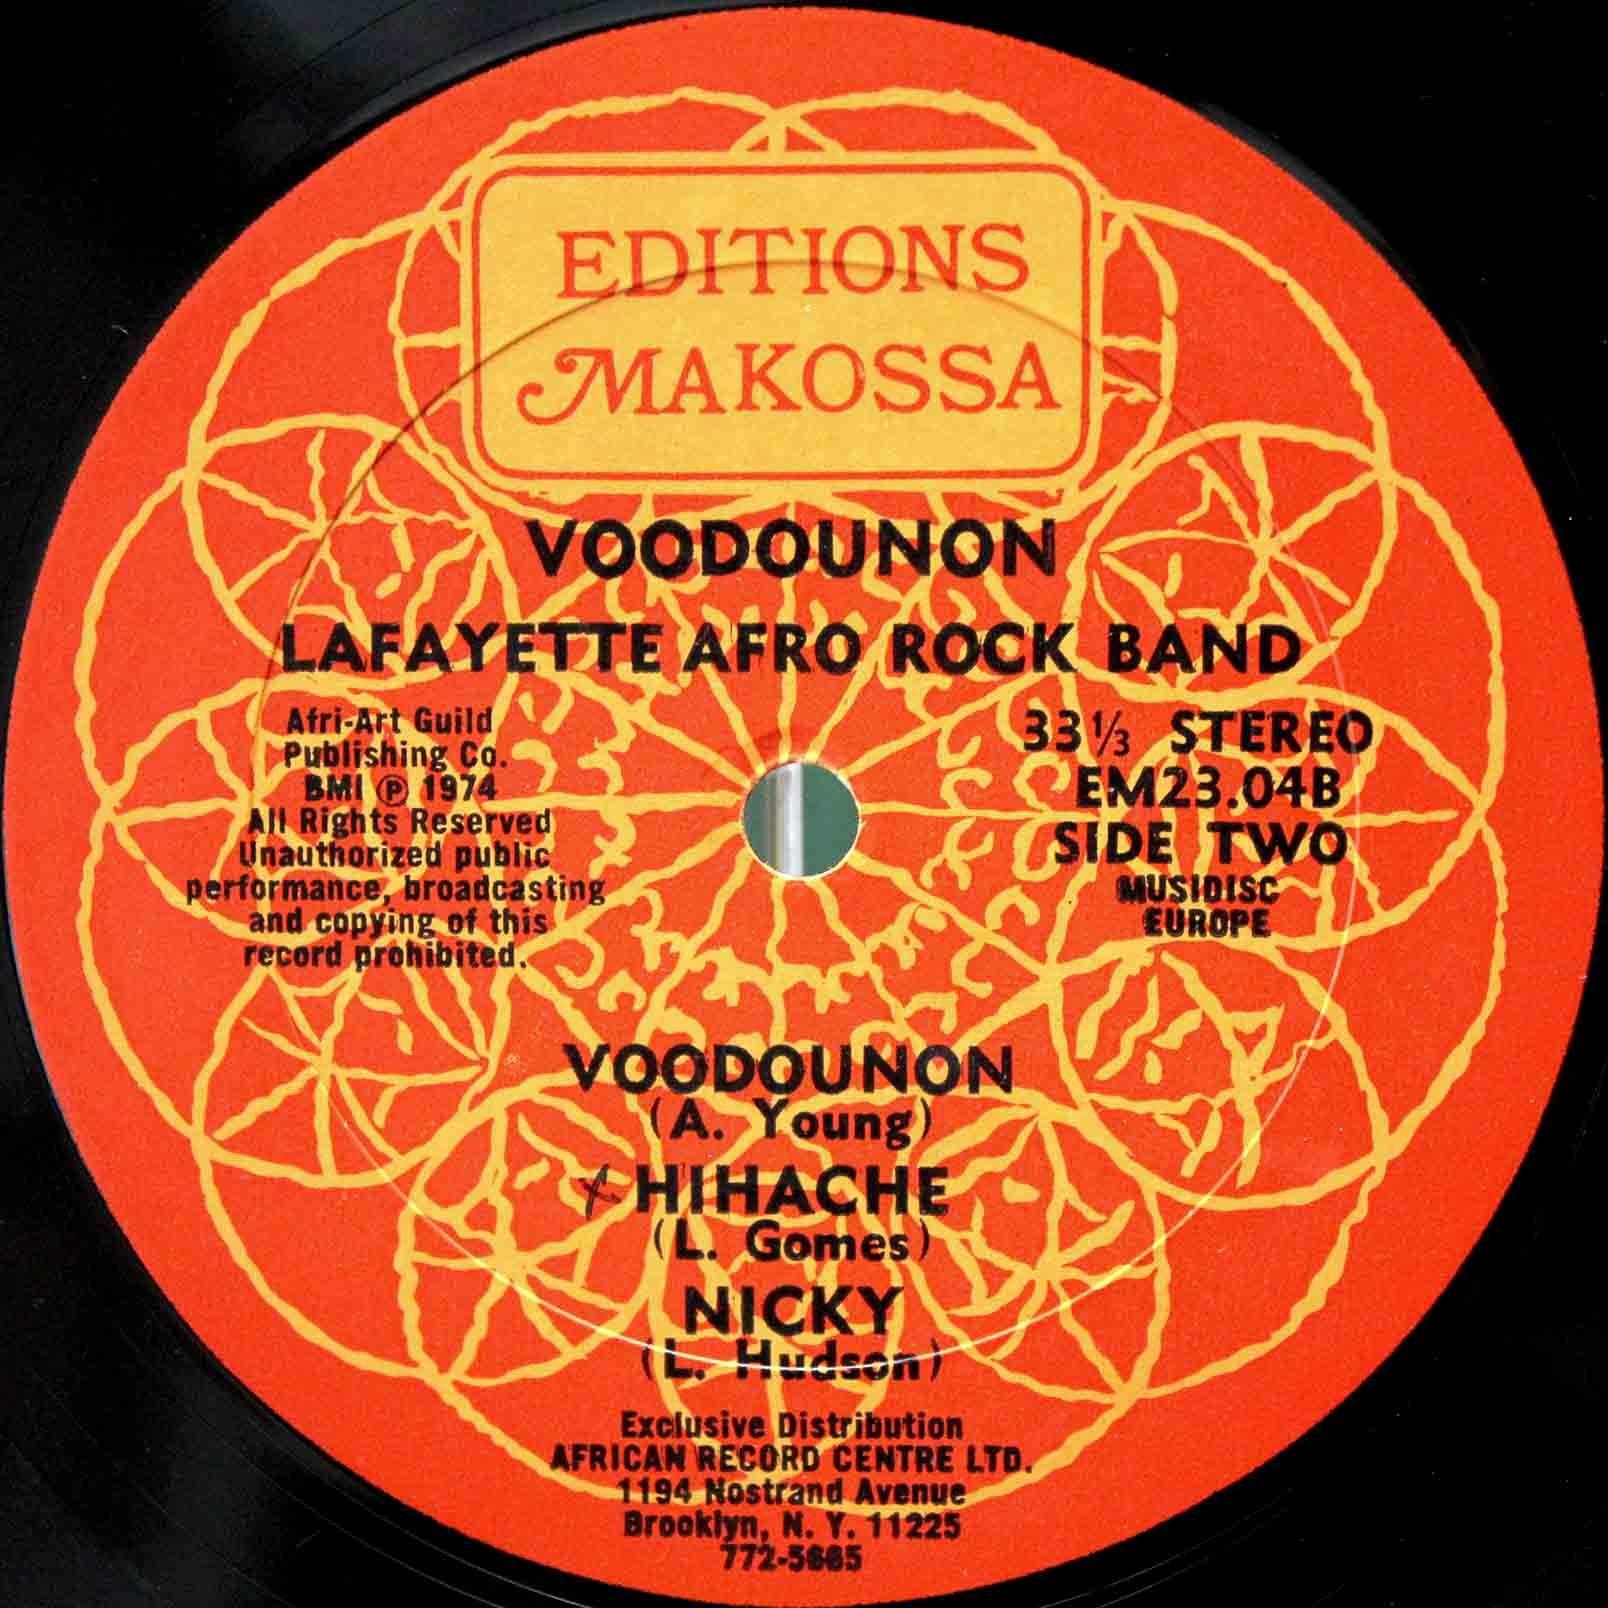 Lafayette Afro Rock Band – Voodounon 04